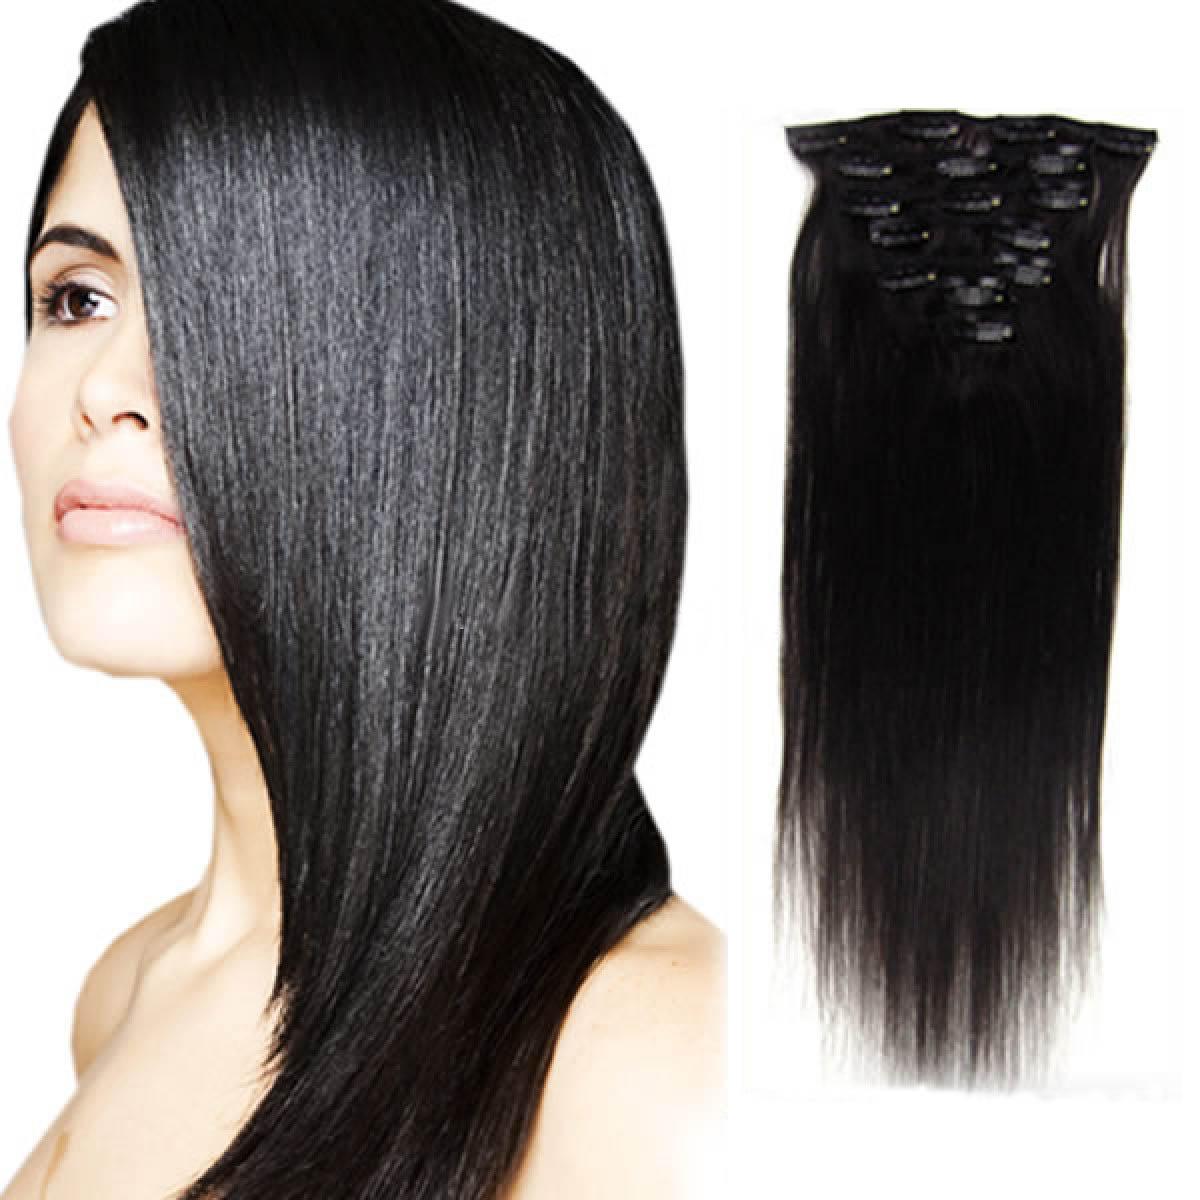 15 Inch #1b Natural Black Clip In Human Hair Extensions 7pcs